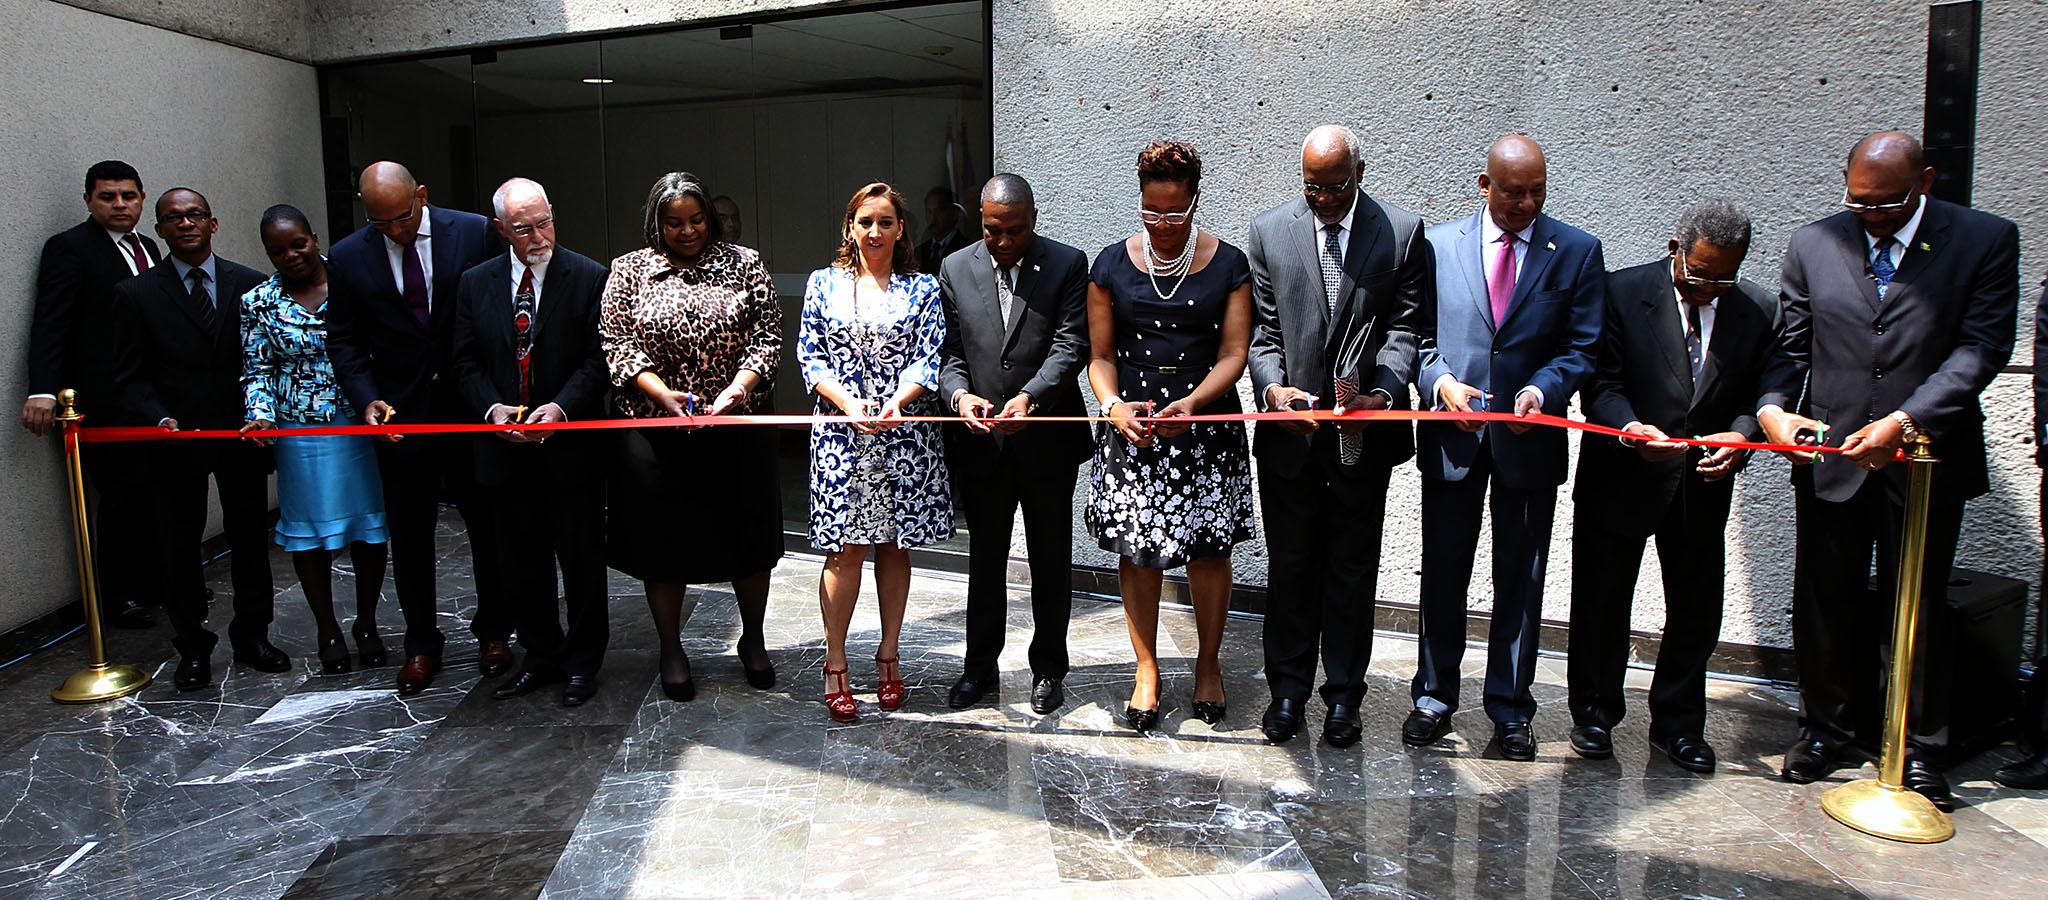 FOTO 2 La canciller Claudia Ruiz Massieu inaugur  oficina para embajadas concurrentes del Caribe.jpg